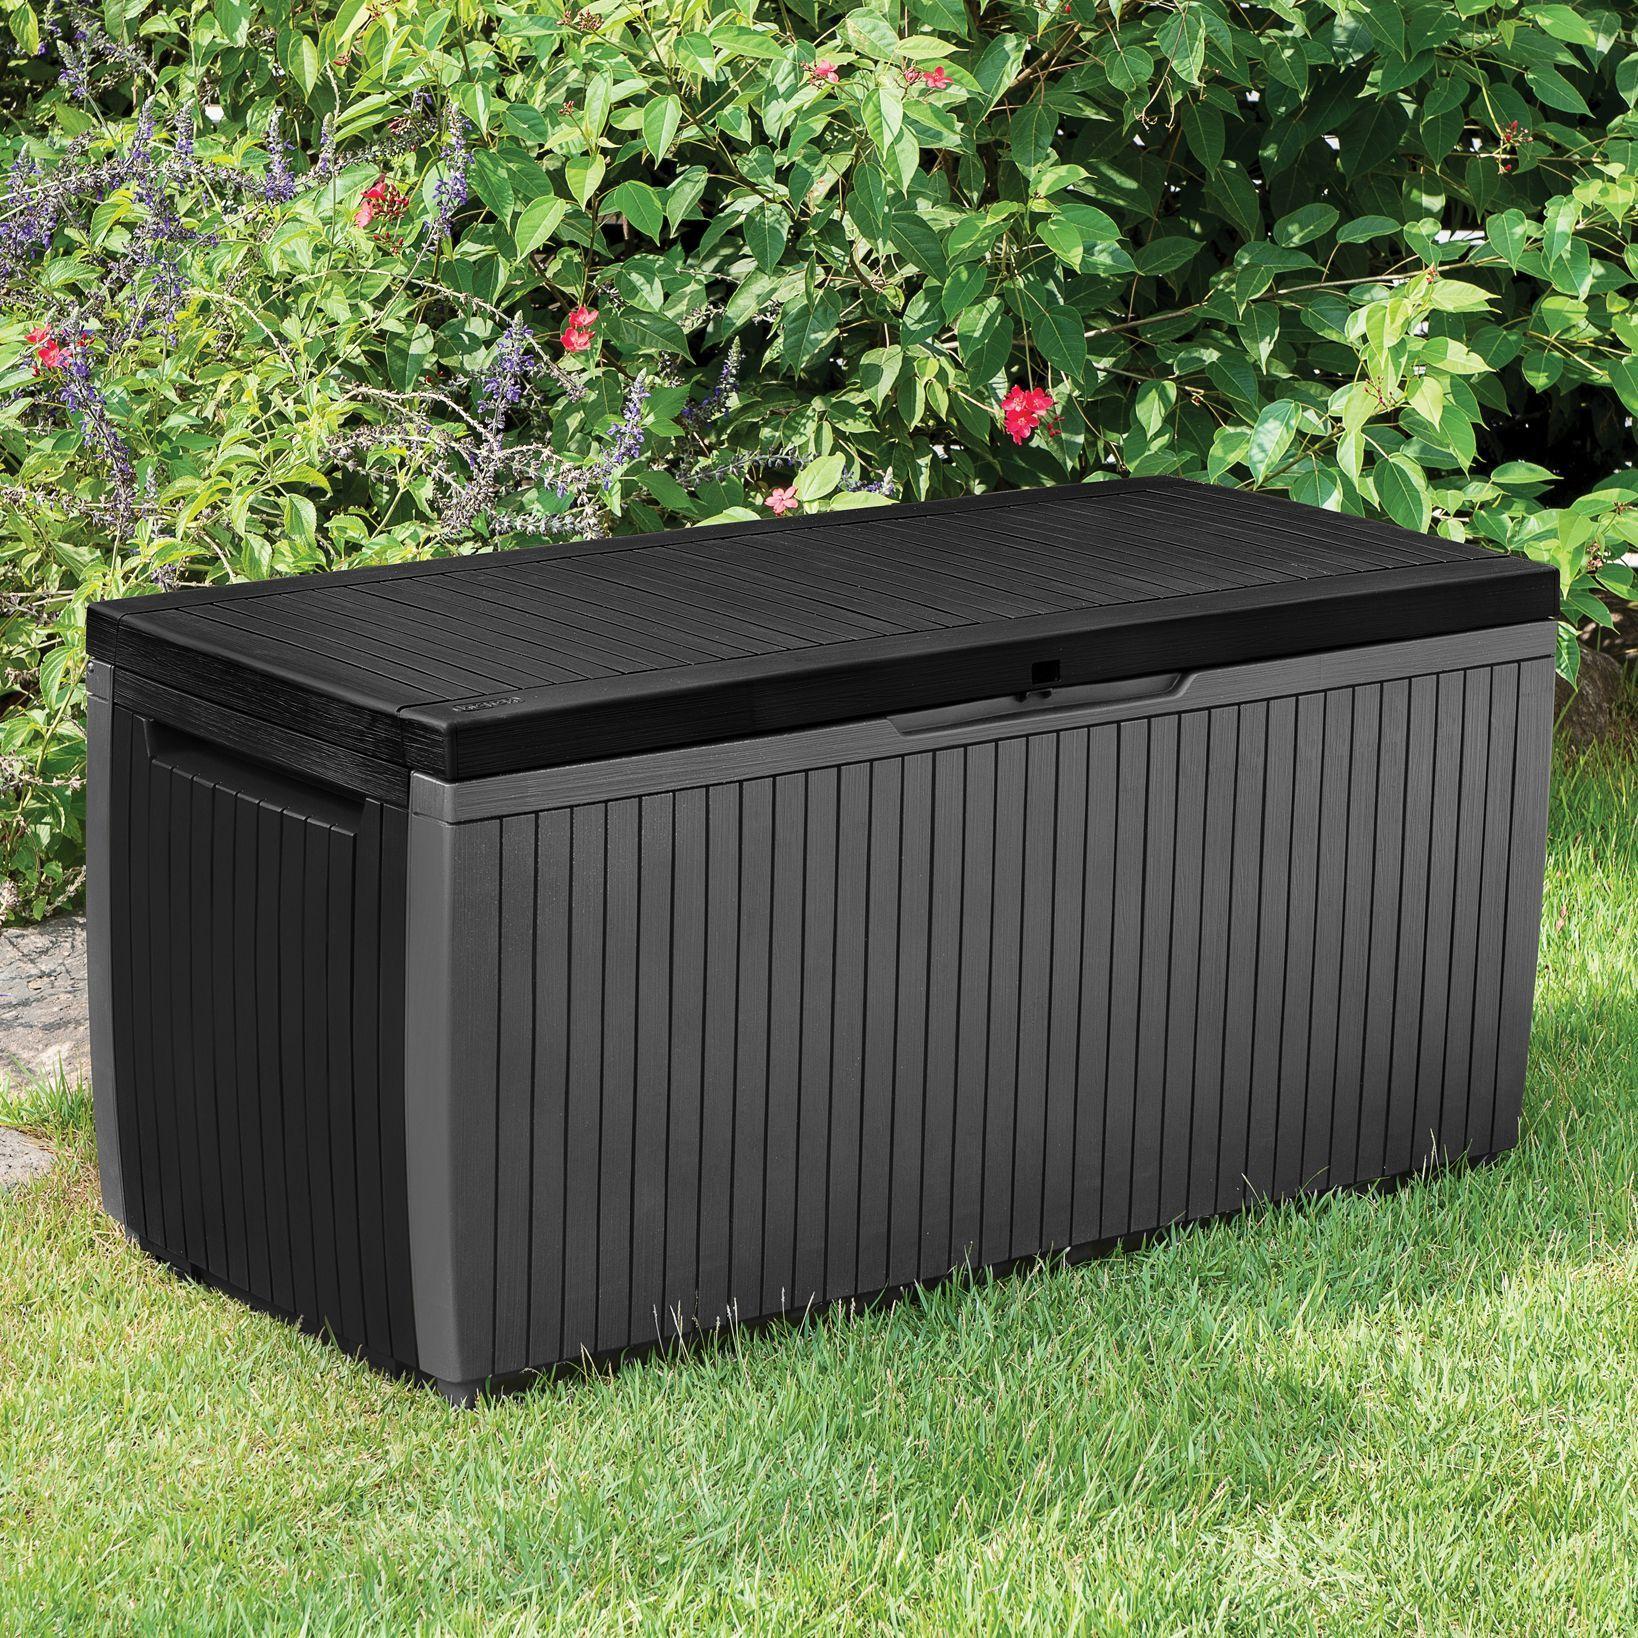 10 Charming Diy Outdoor Storage Ideas Diy Storage Bench Outdoor Storage Bench Diy Storage